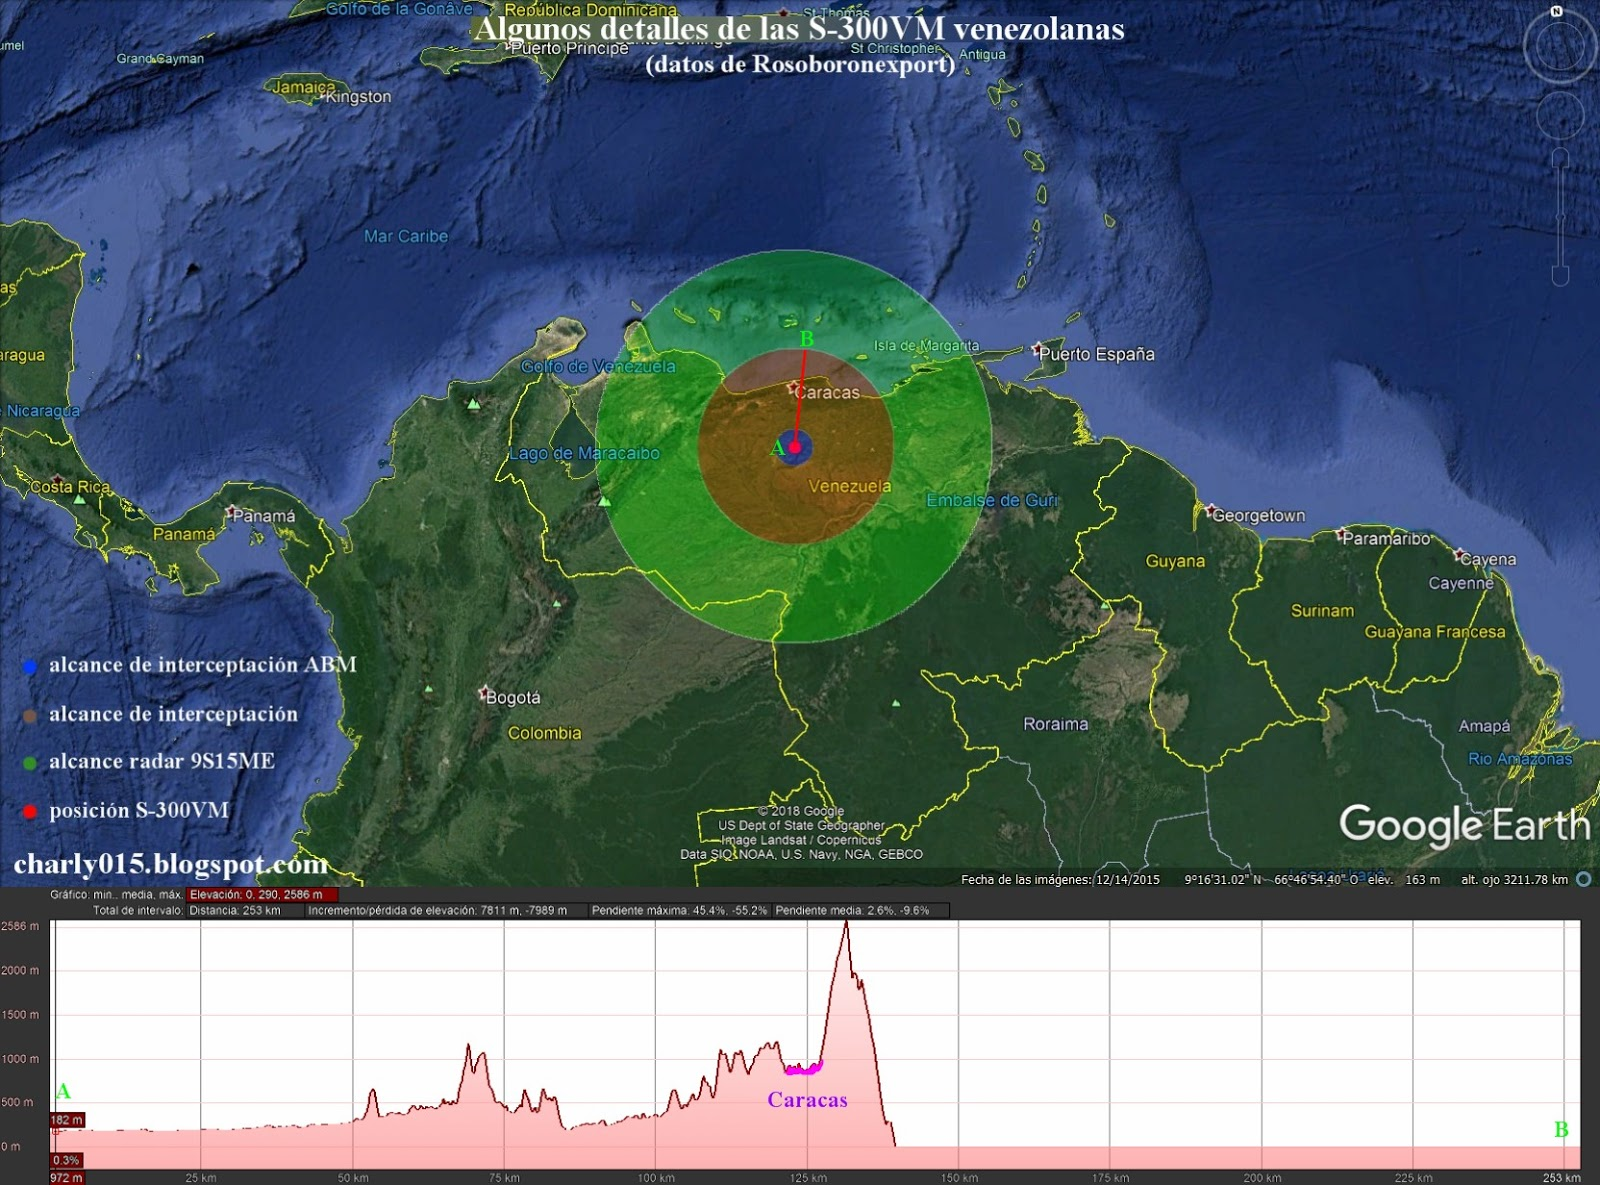 CODAI - Página 16 Venezuela%2Bs-300vm%2Bcobertura%2Borograf%25C3%25ADa%2Bcaracas%2Bsin%2Bcobertura%2B2